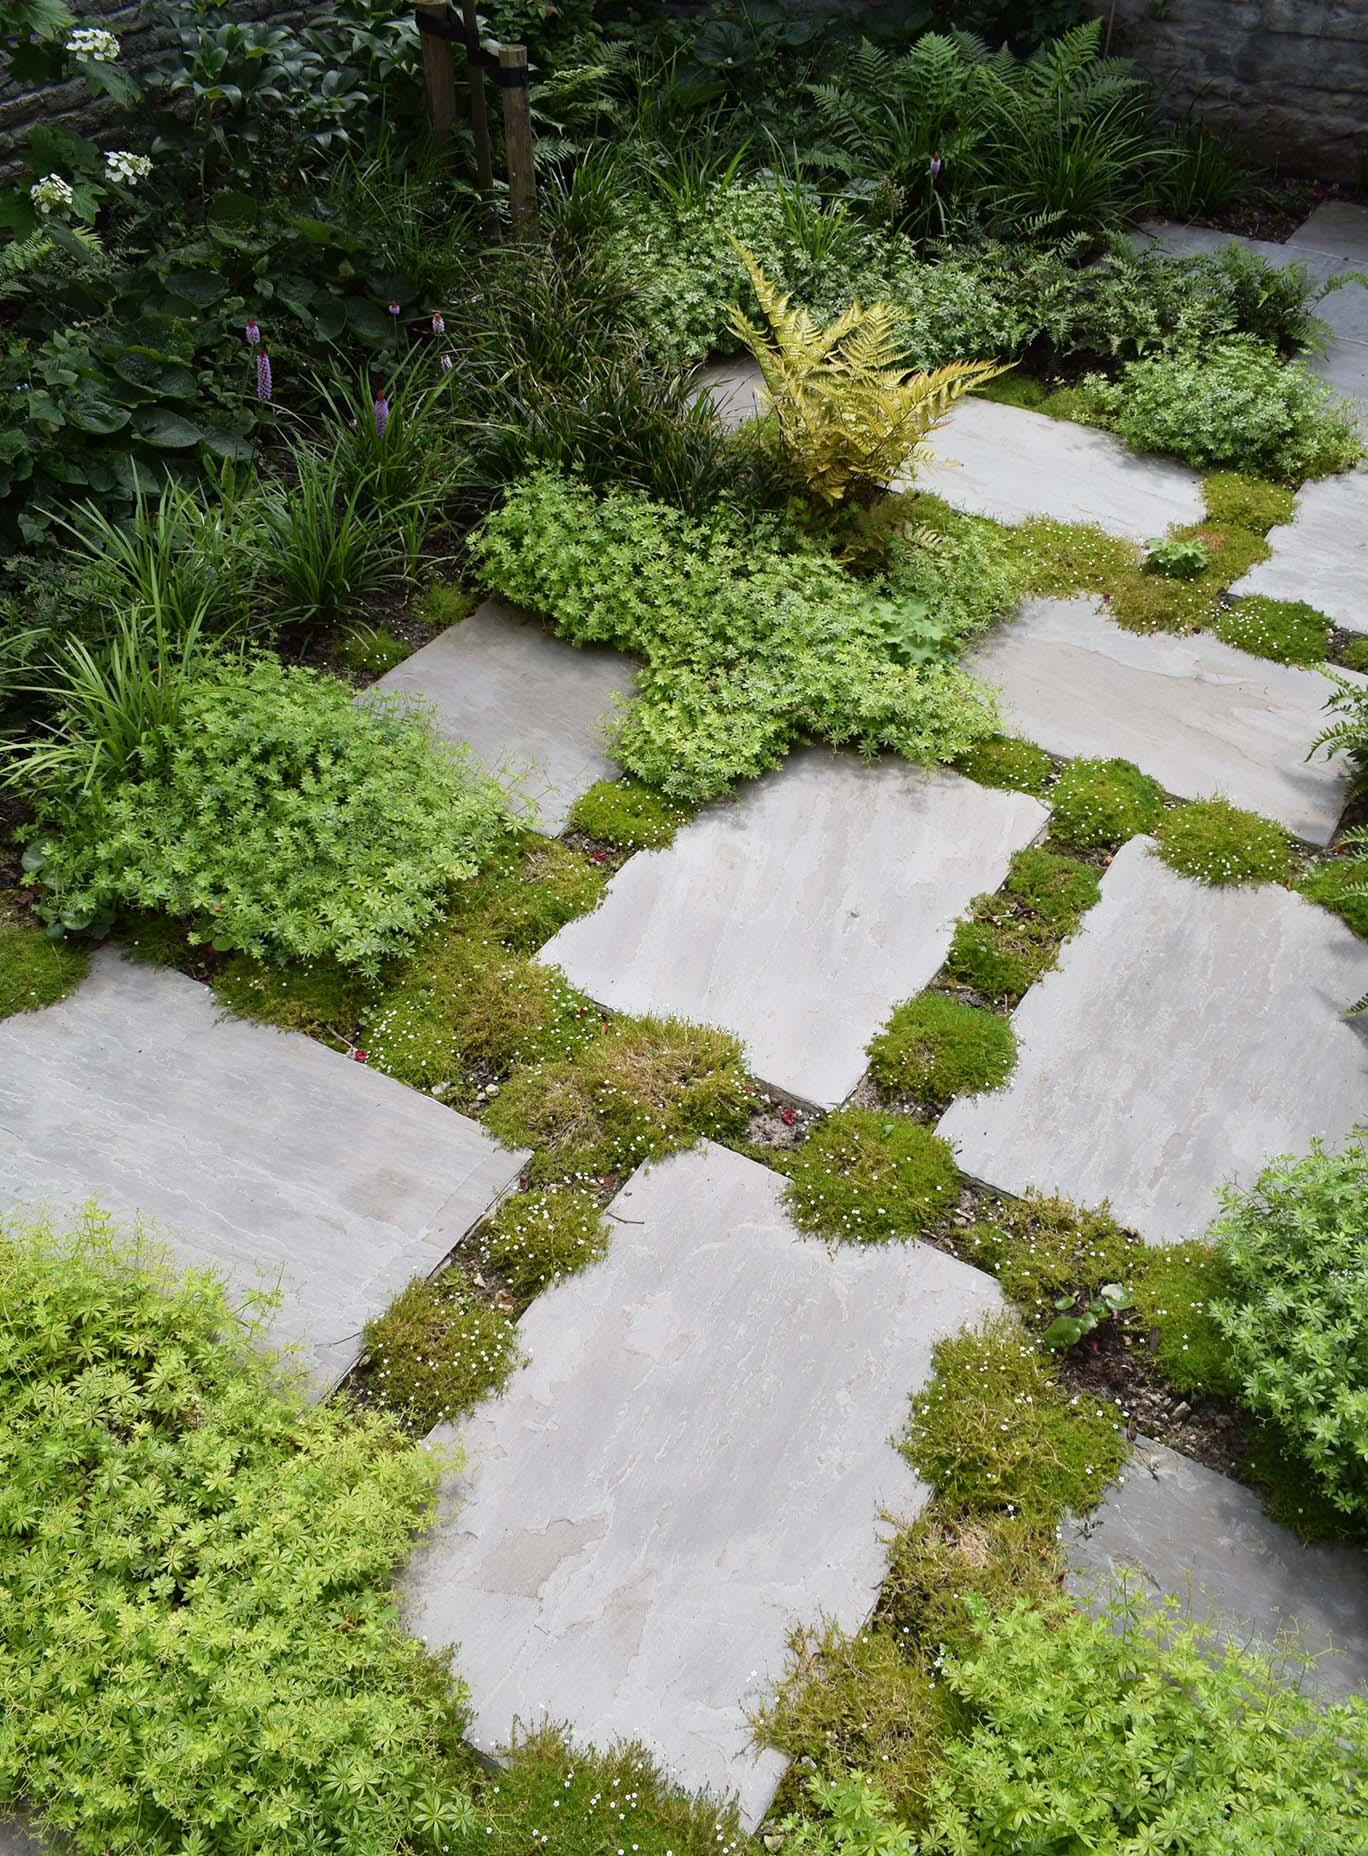 paysagiste_steyaert_bruxelles_jardin_marches_gres_textures_compact